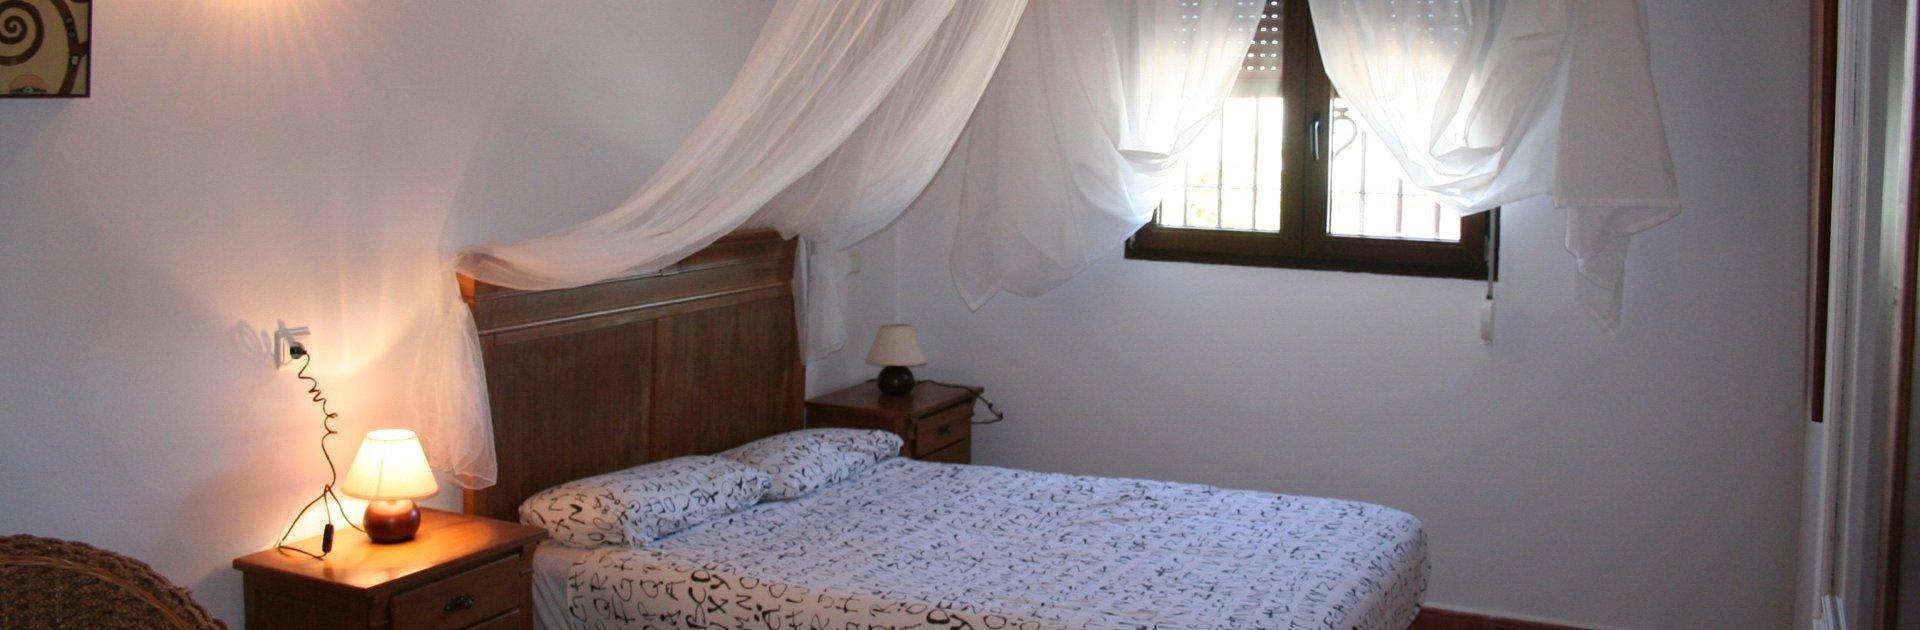 Finca - Schlafzimmer